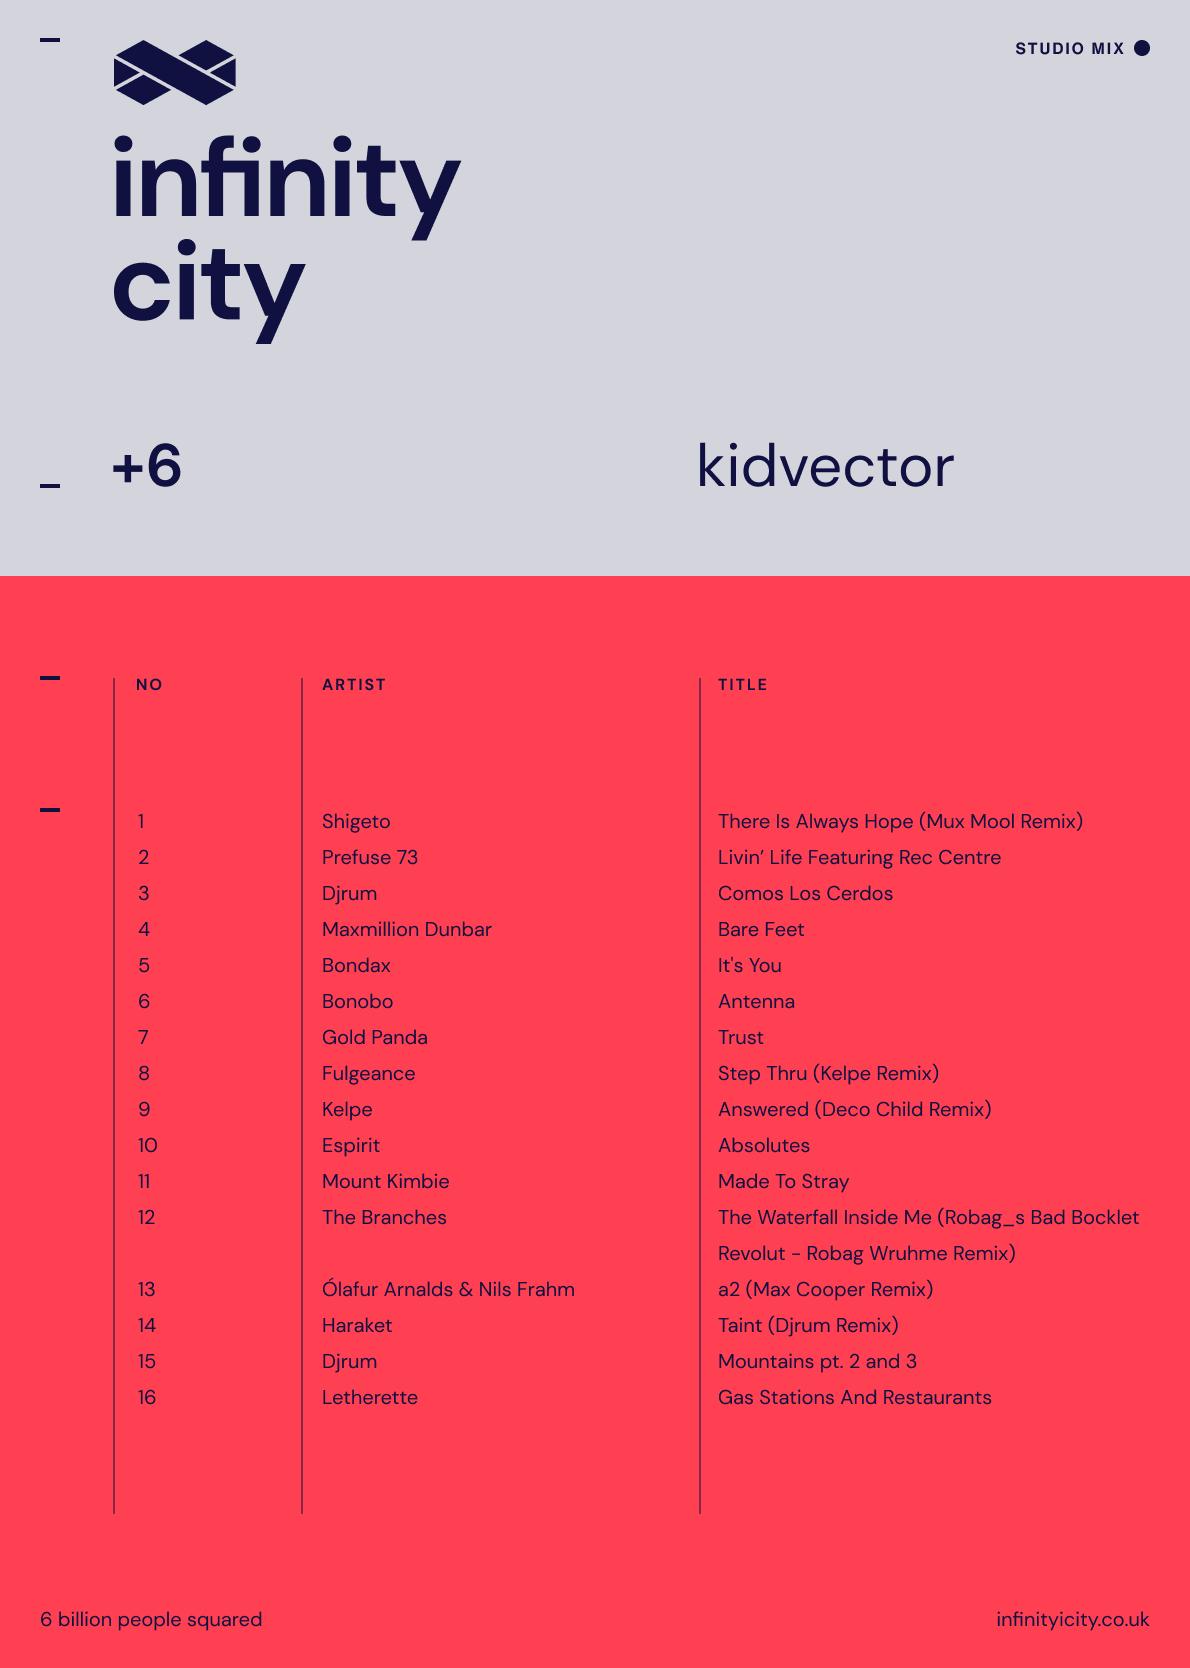 Infinity City + 6 - KidVector